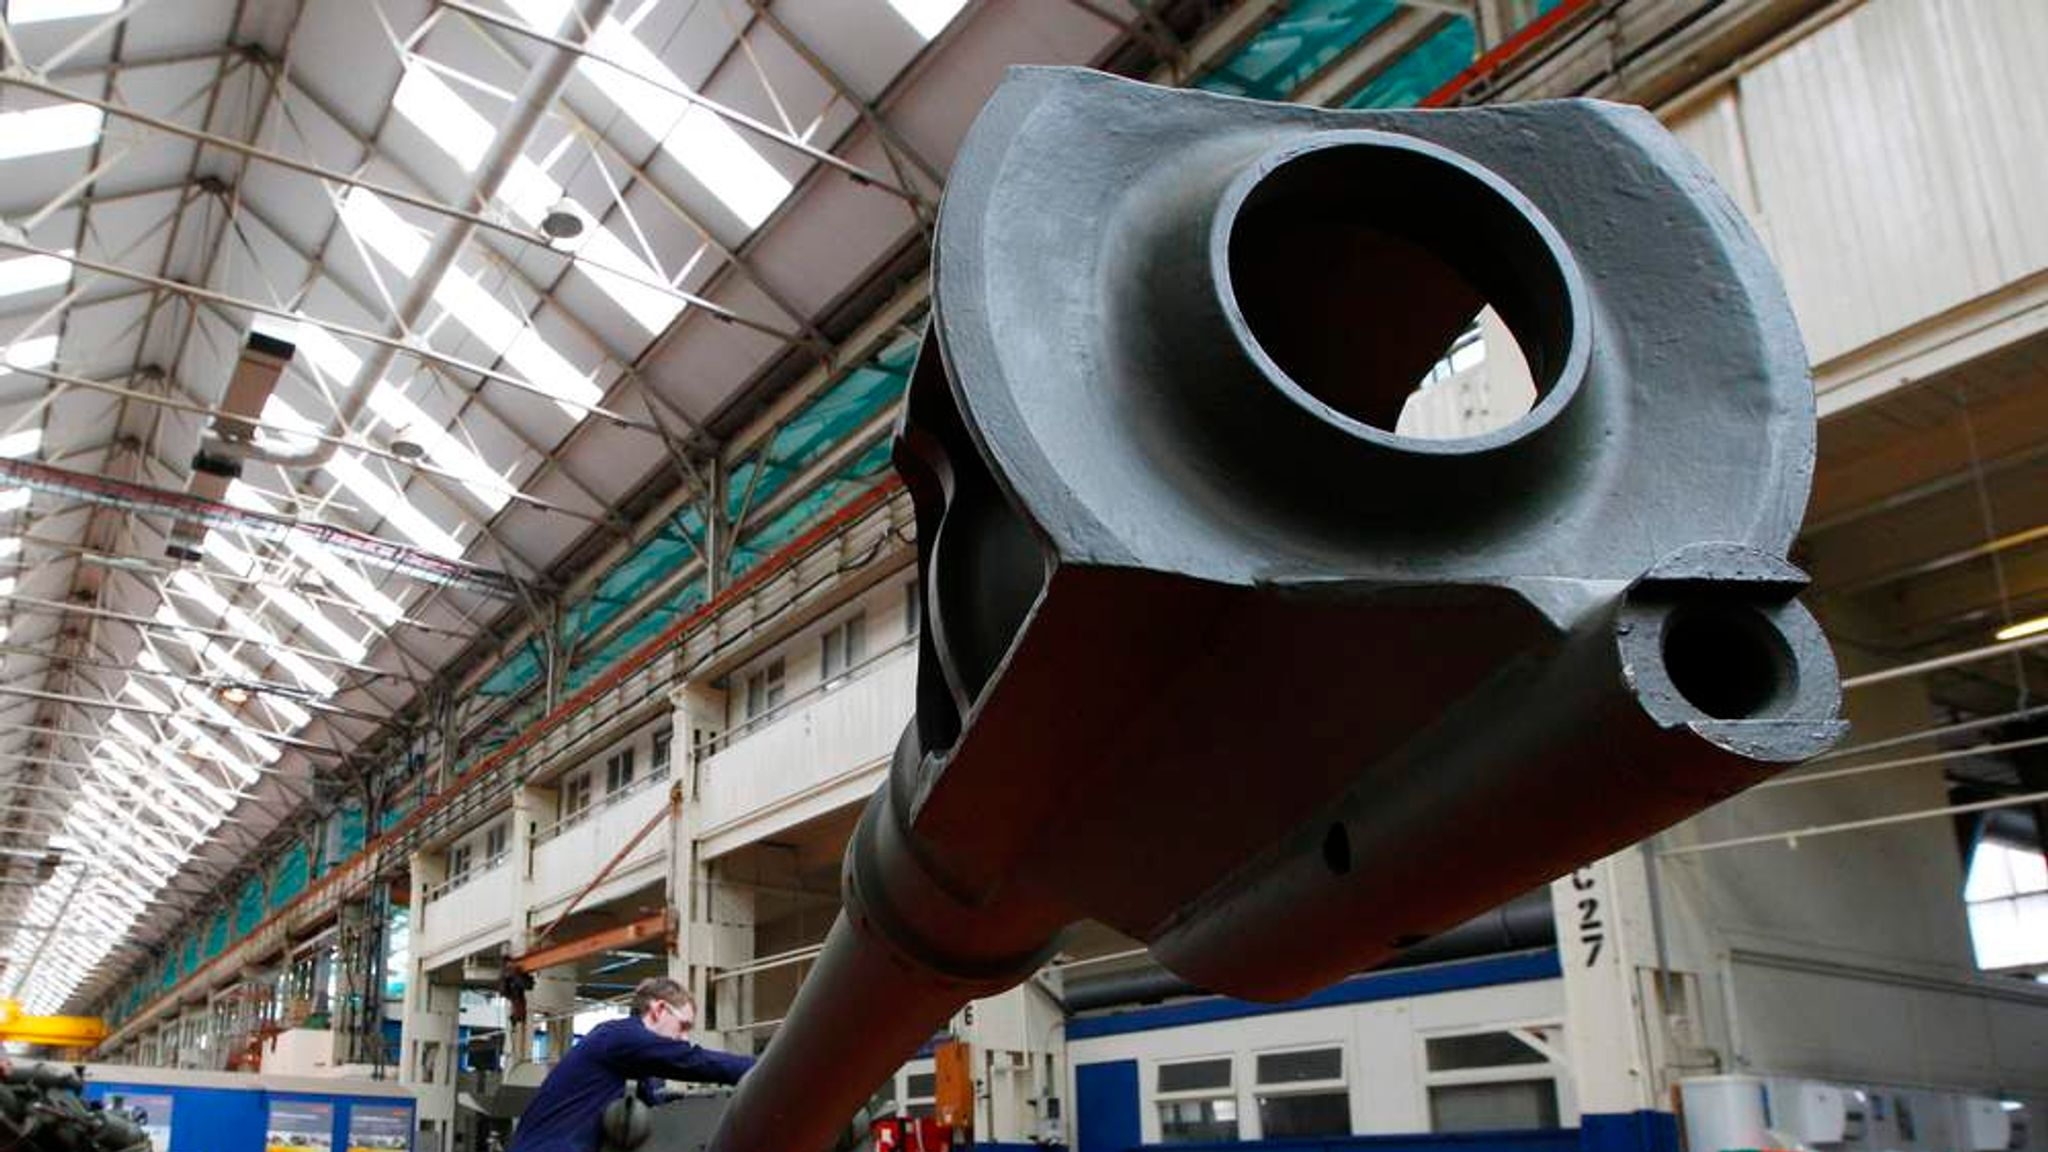 Defence Merger Under Pressure From Investors | Business News | Sky News